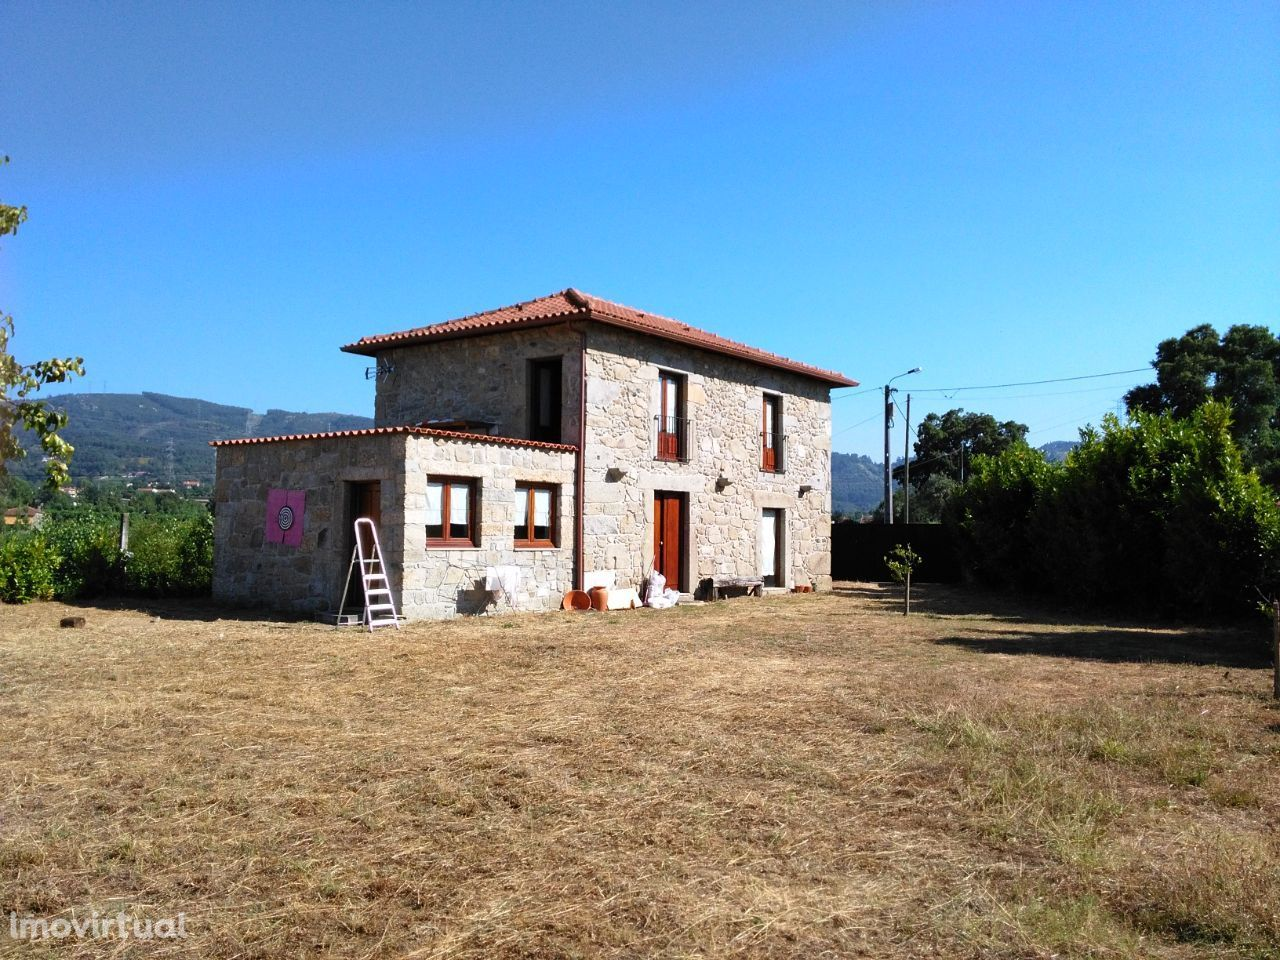 QUINTINHA 4300 m2 Navarra, Braga - 30 min Parque Nacional Peneda GERÊS